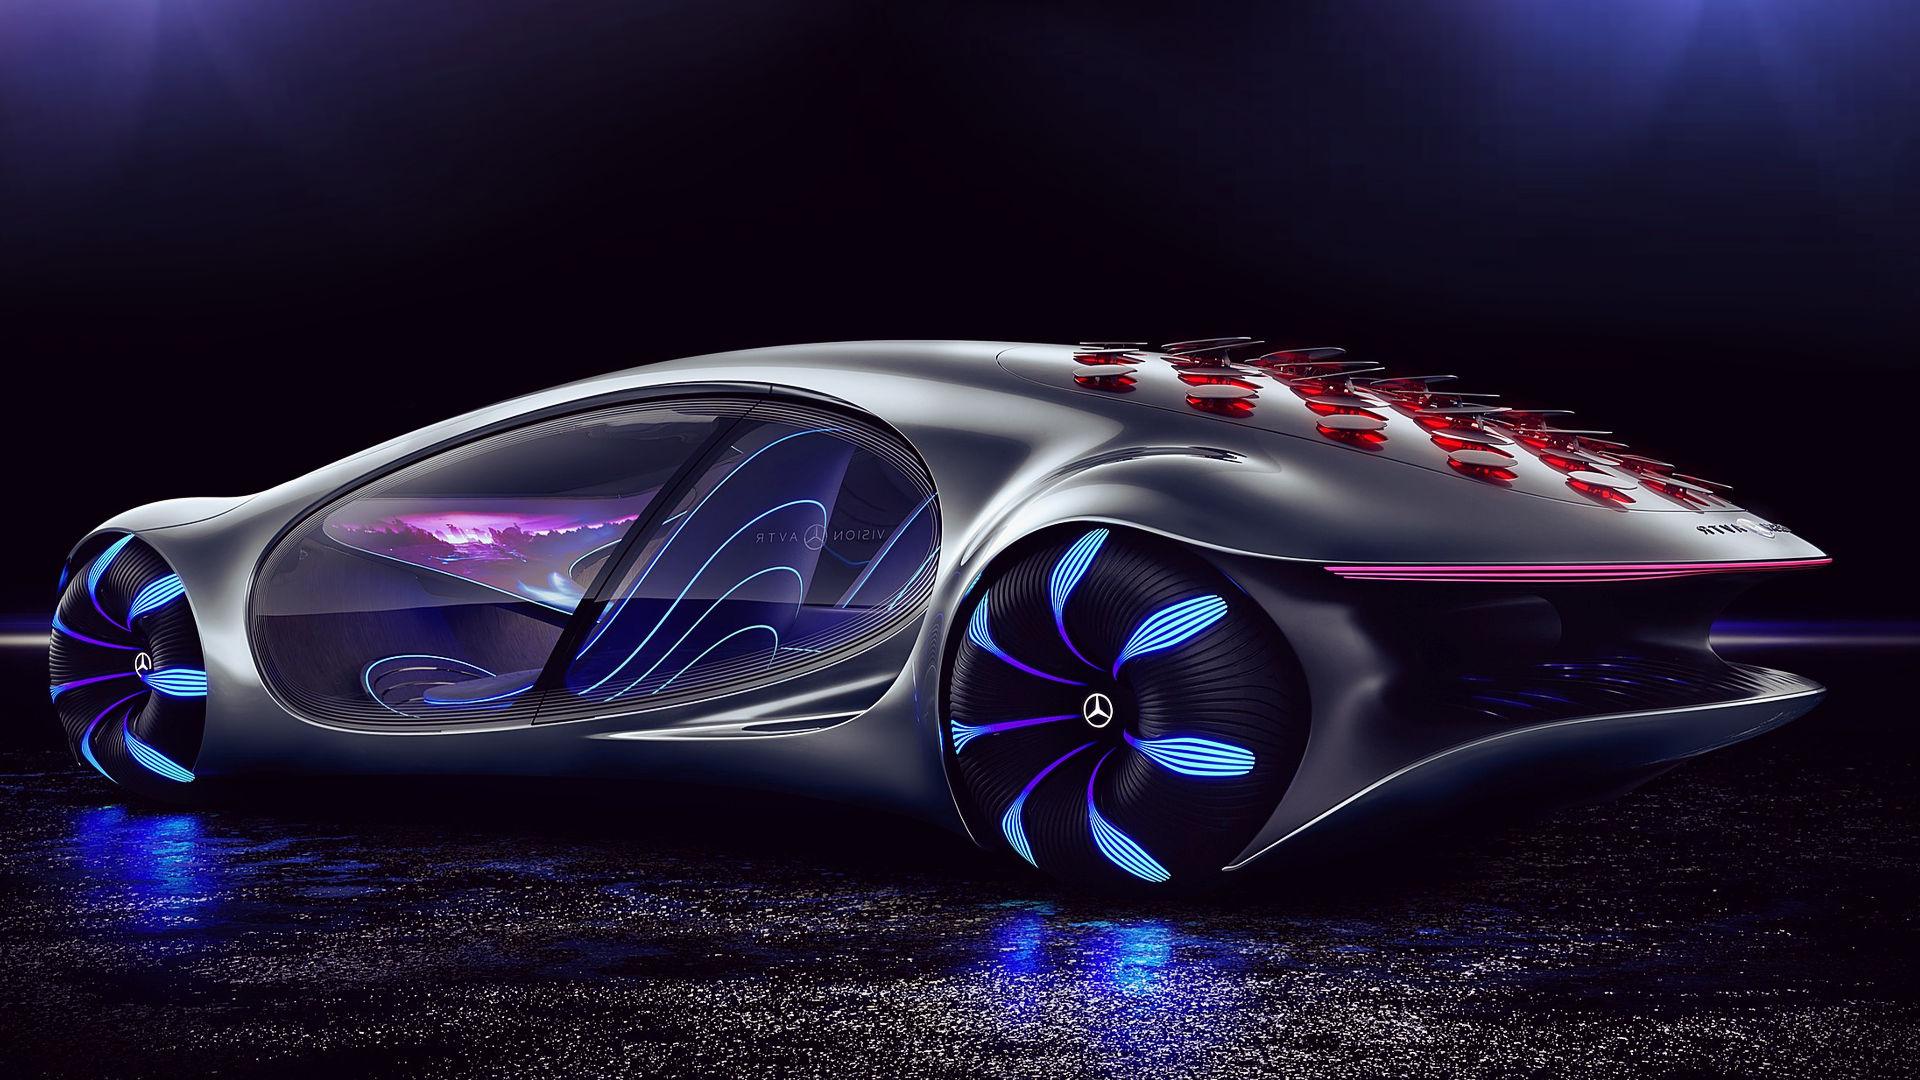 Mercedes Benz Vision Avtr Concept 2020 Hd Wallpaper 1920x1080